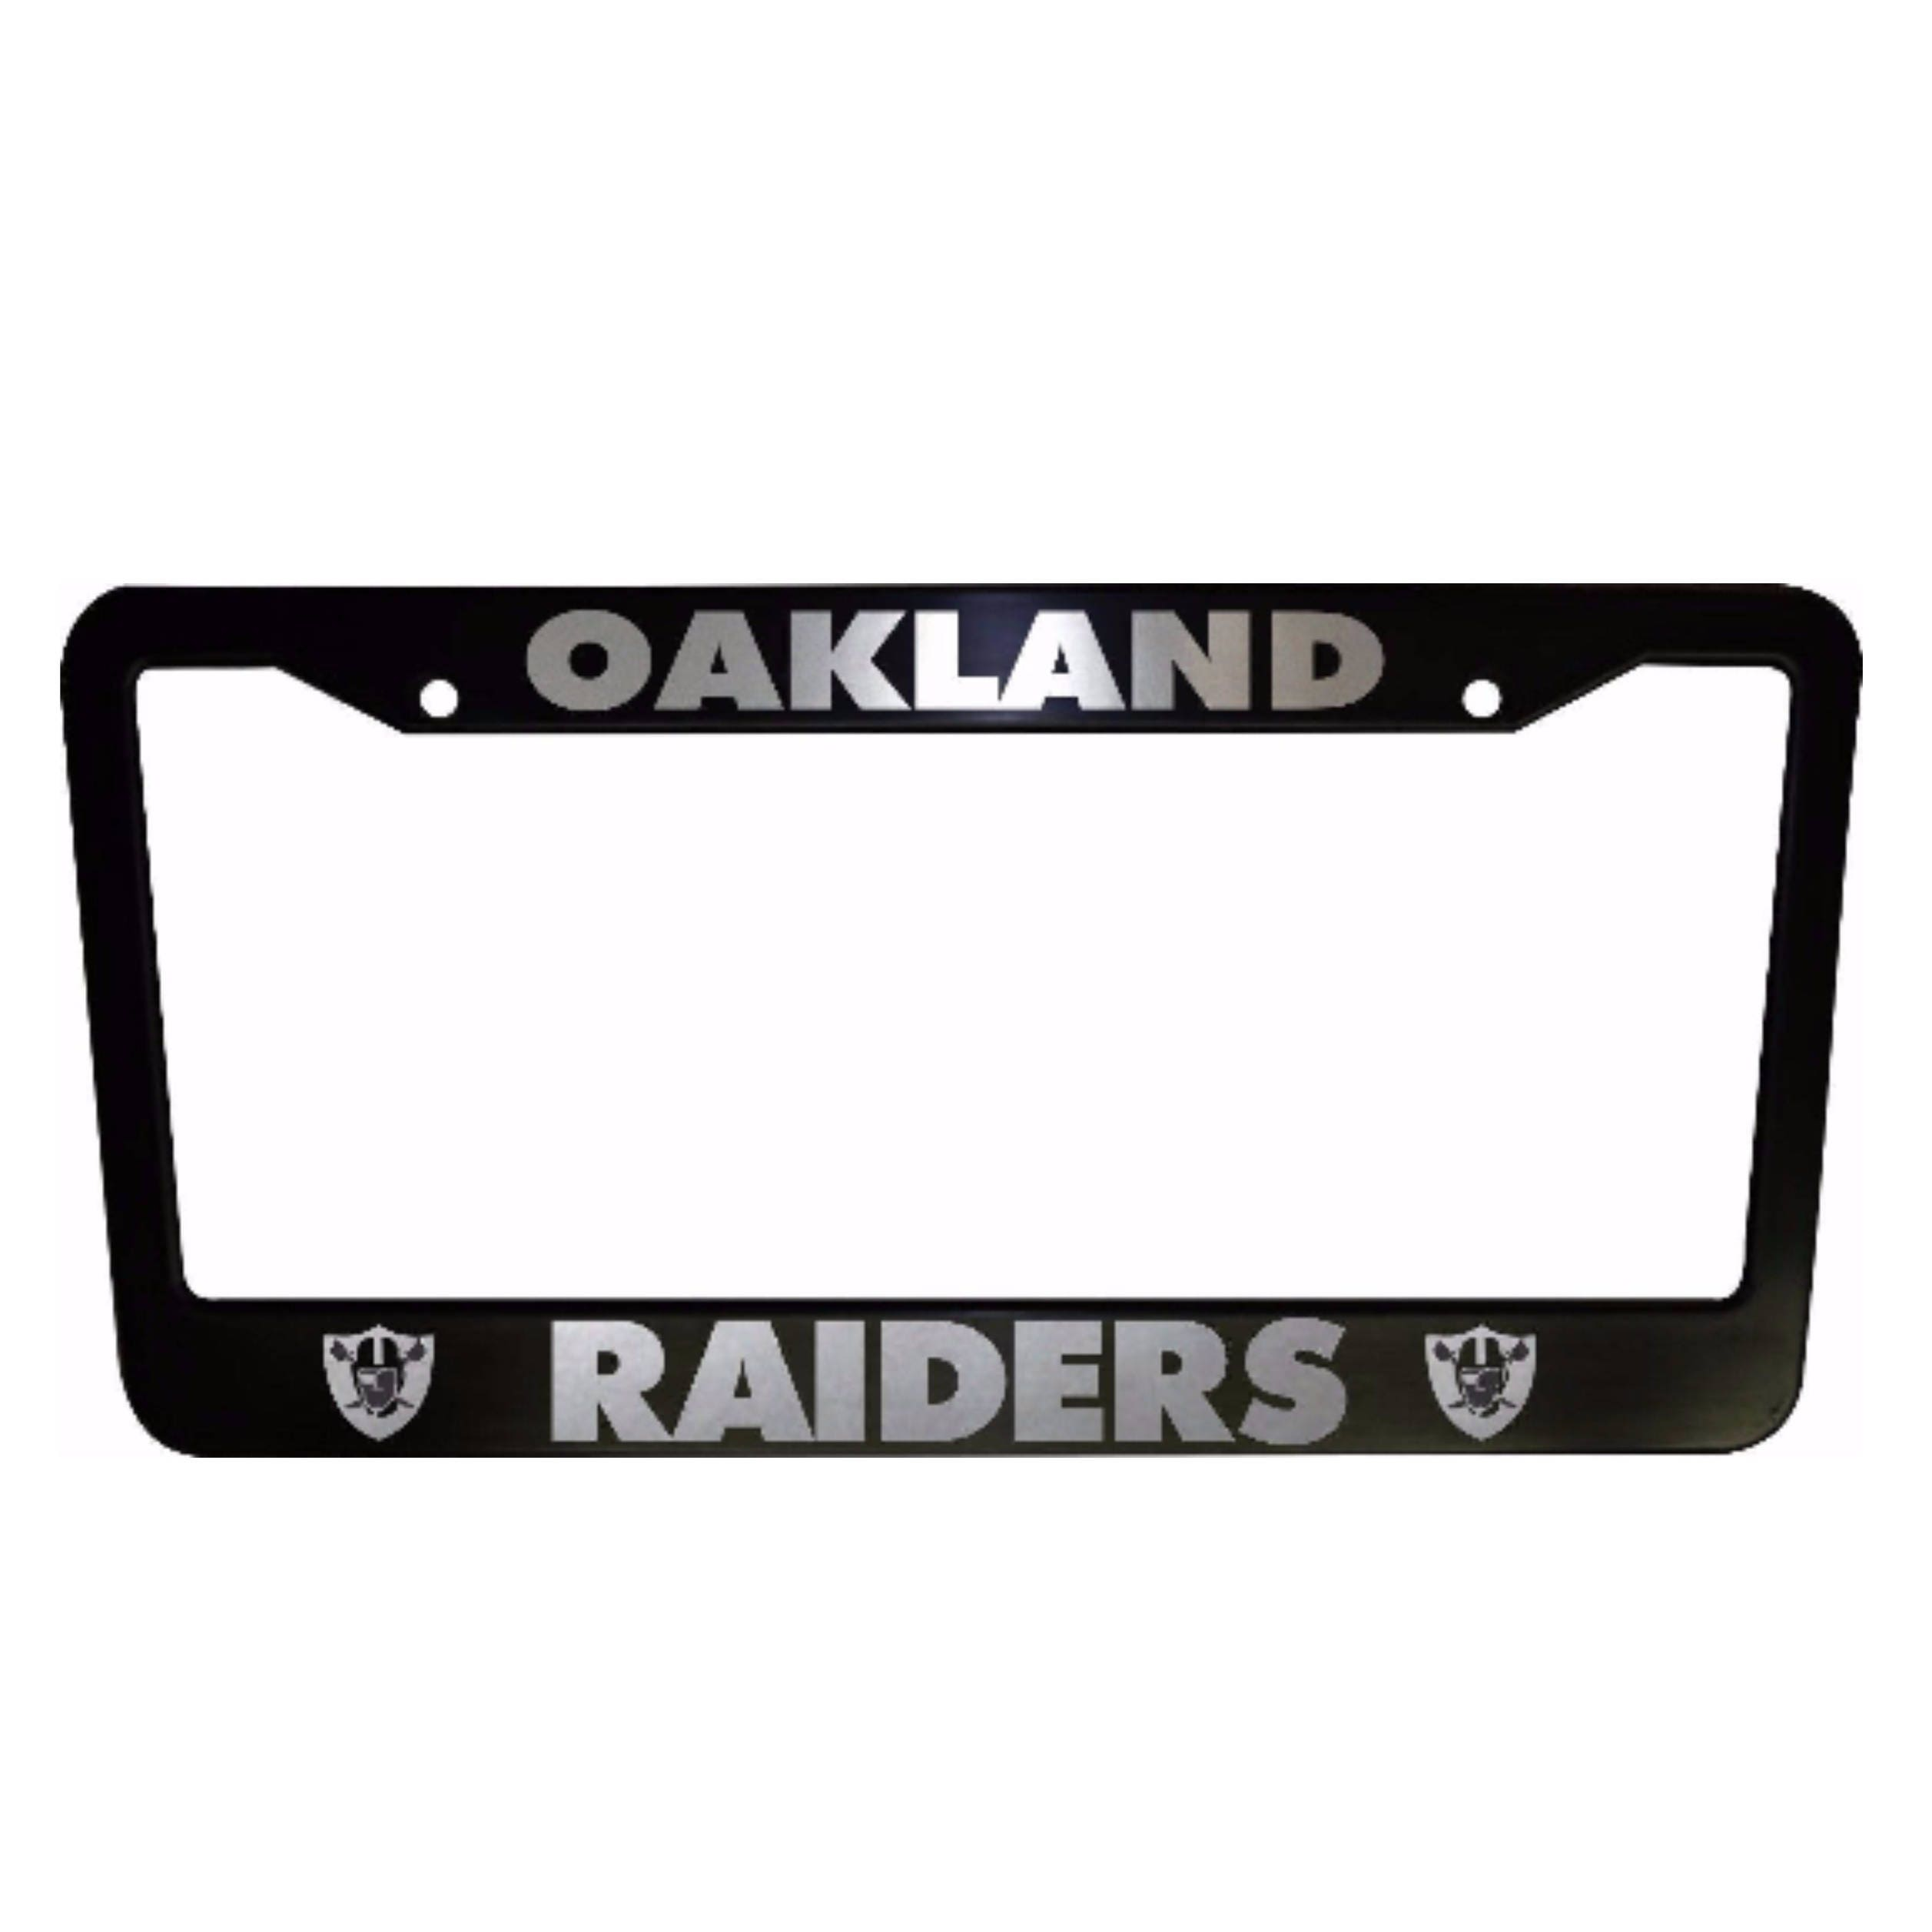 2 PAIR Oakland Raiders Black Plastic License Plate Frame | Etsy